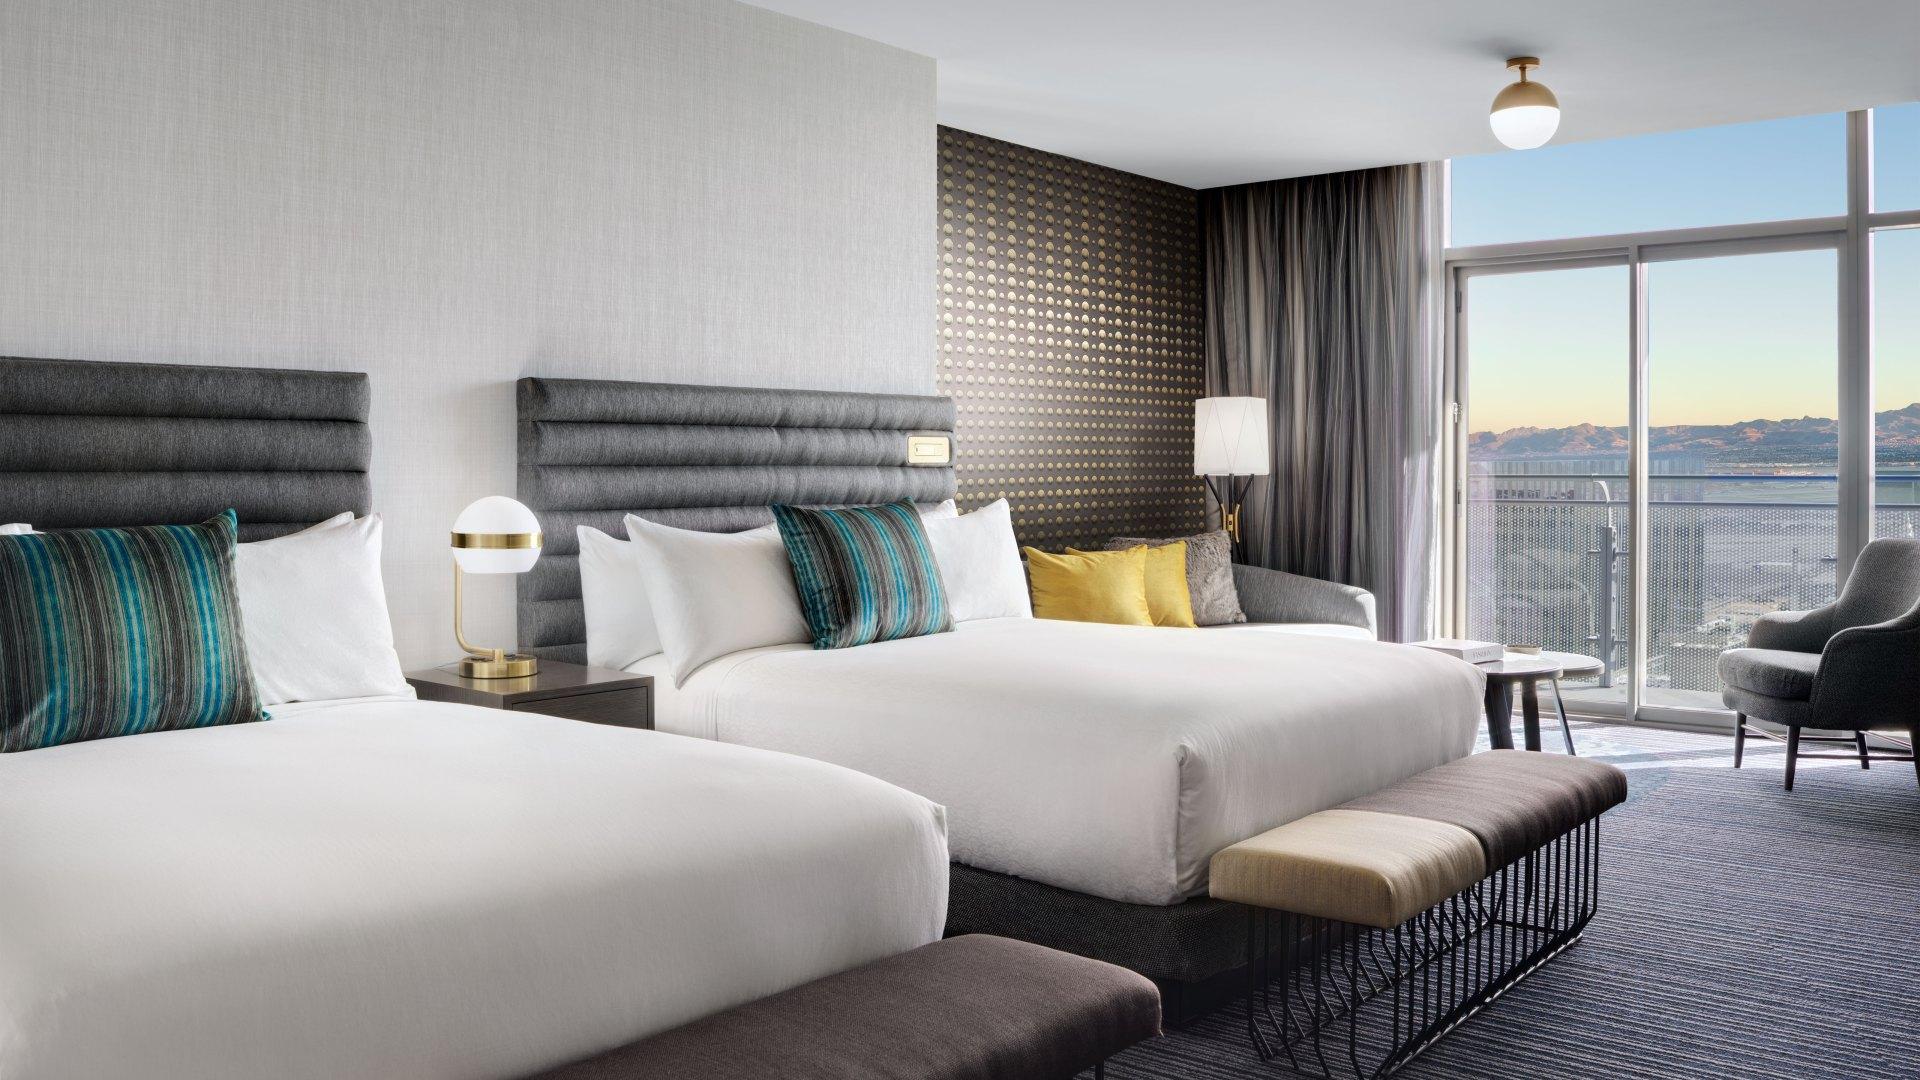 Las Vegas Luxury Hotel Rooms And Suites Cosmopolitan